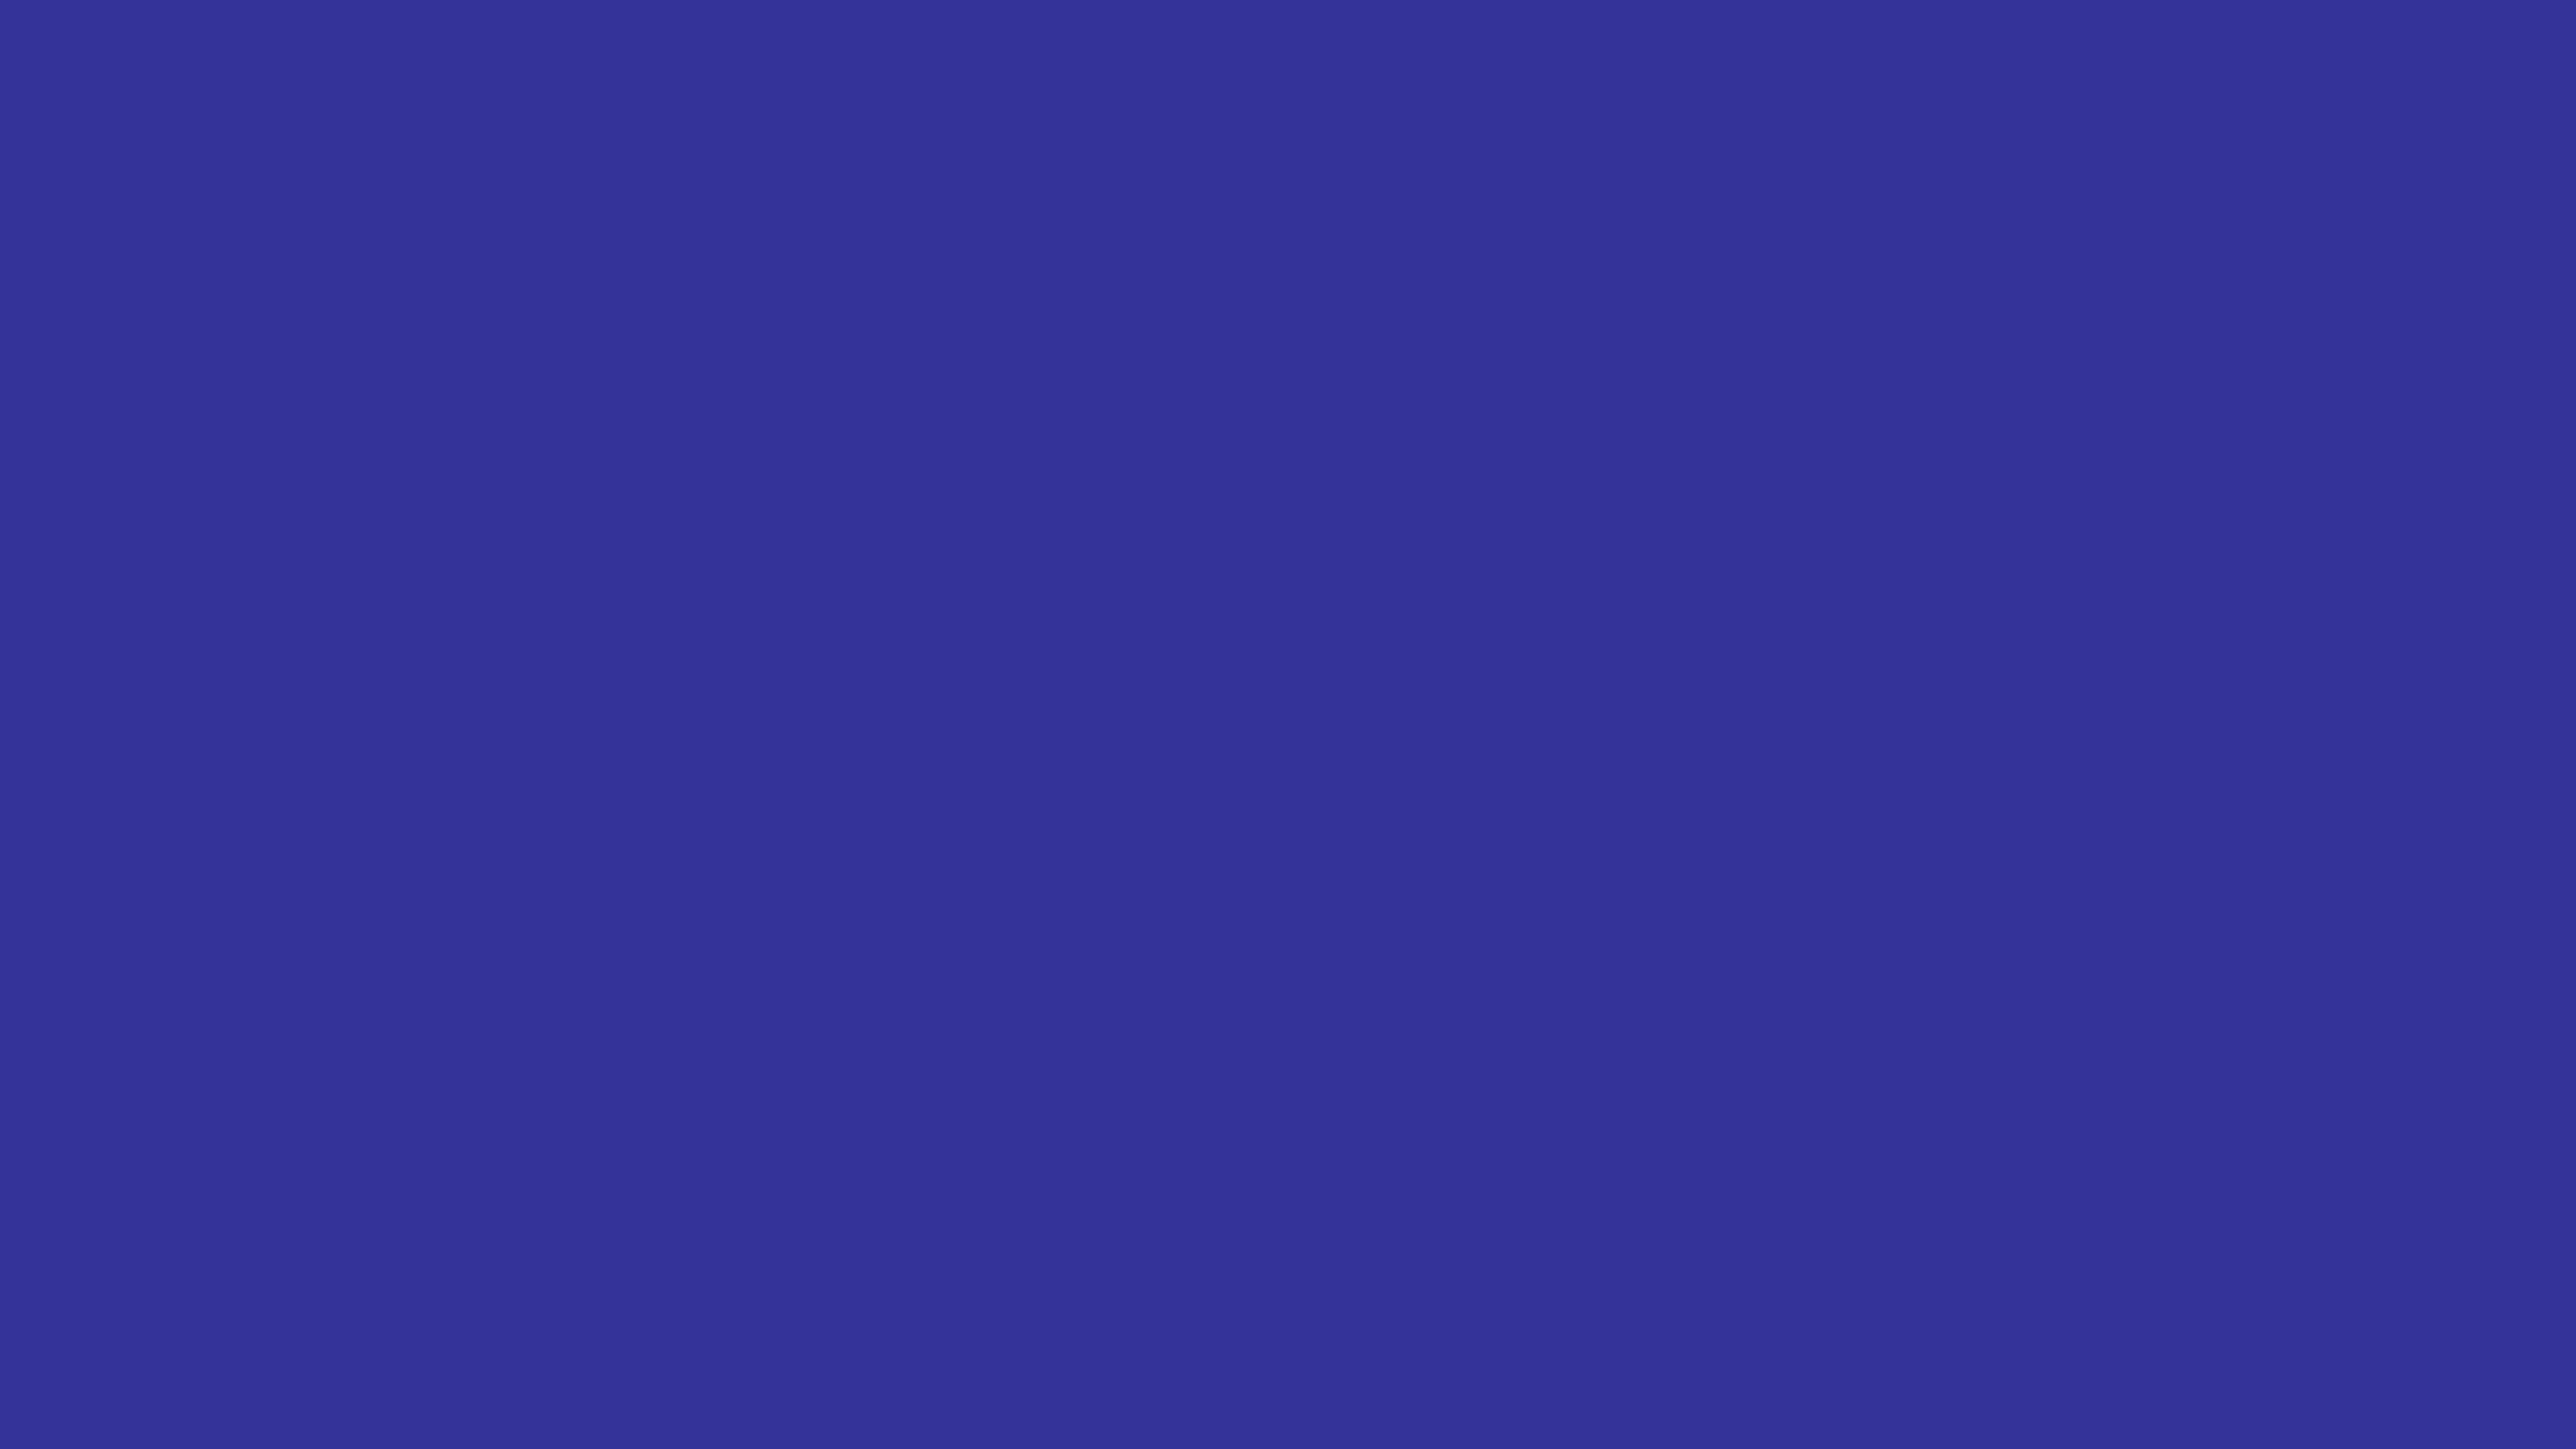 3840x2160 Blue Pigment Solid Color Background